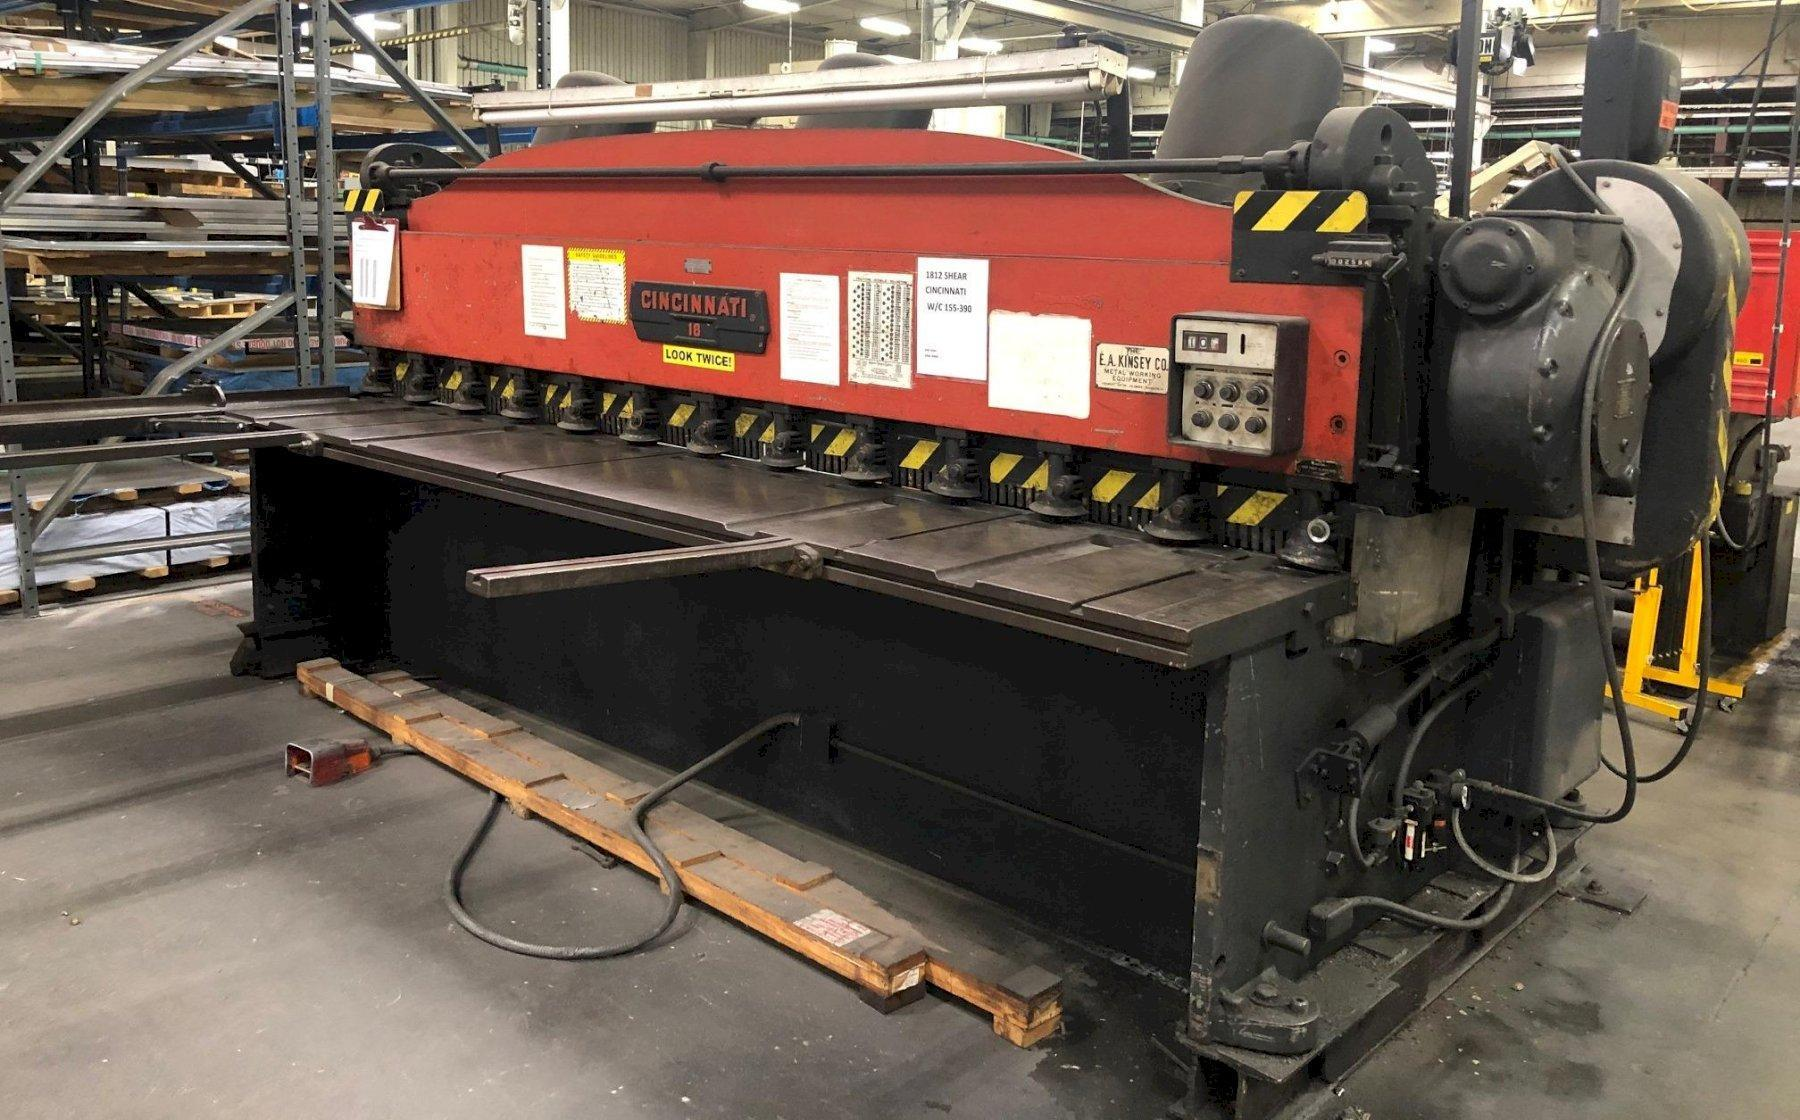 "12' x 1/4"" Cincinnati Mechanical Power Shear, No. 1812, 36"" FOPBG, Squaring Arm, Front Supports"